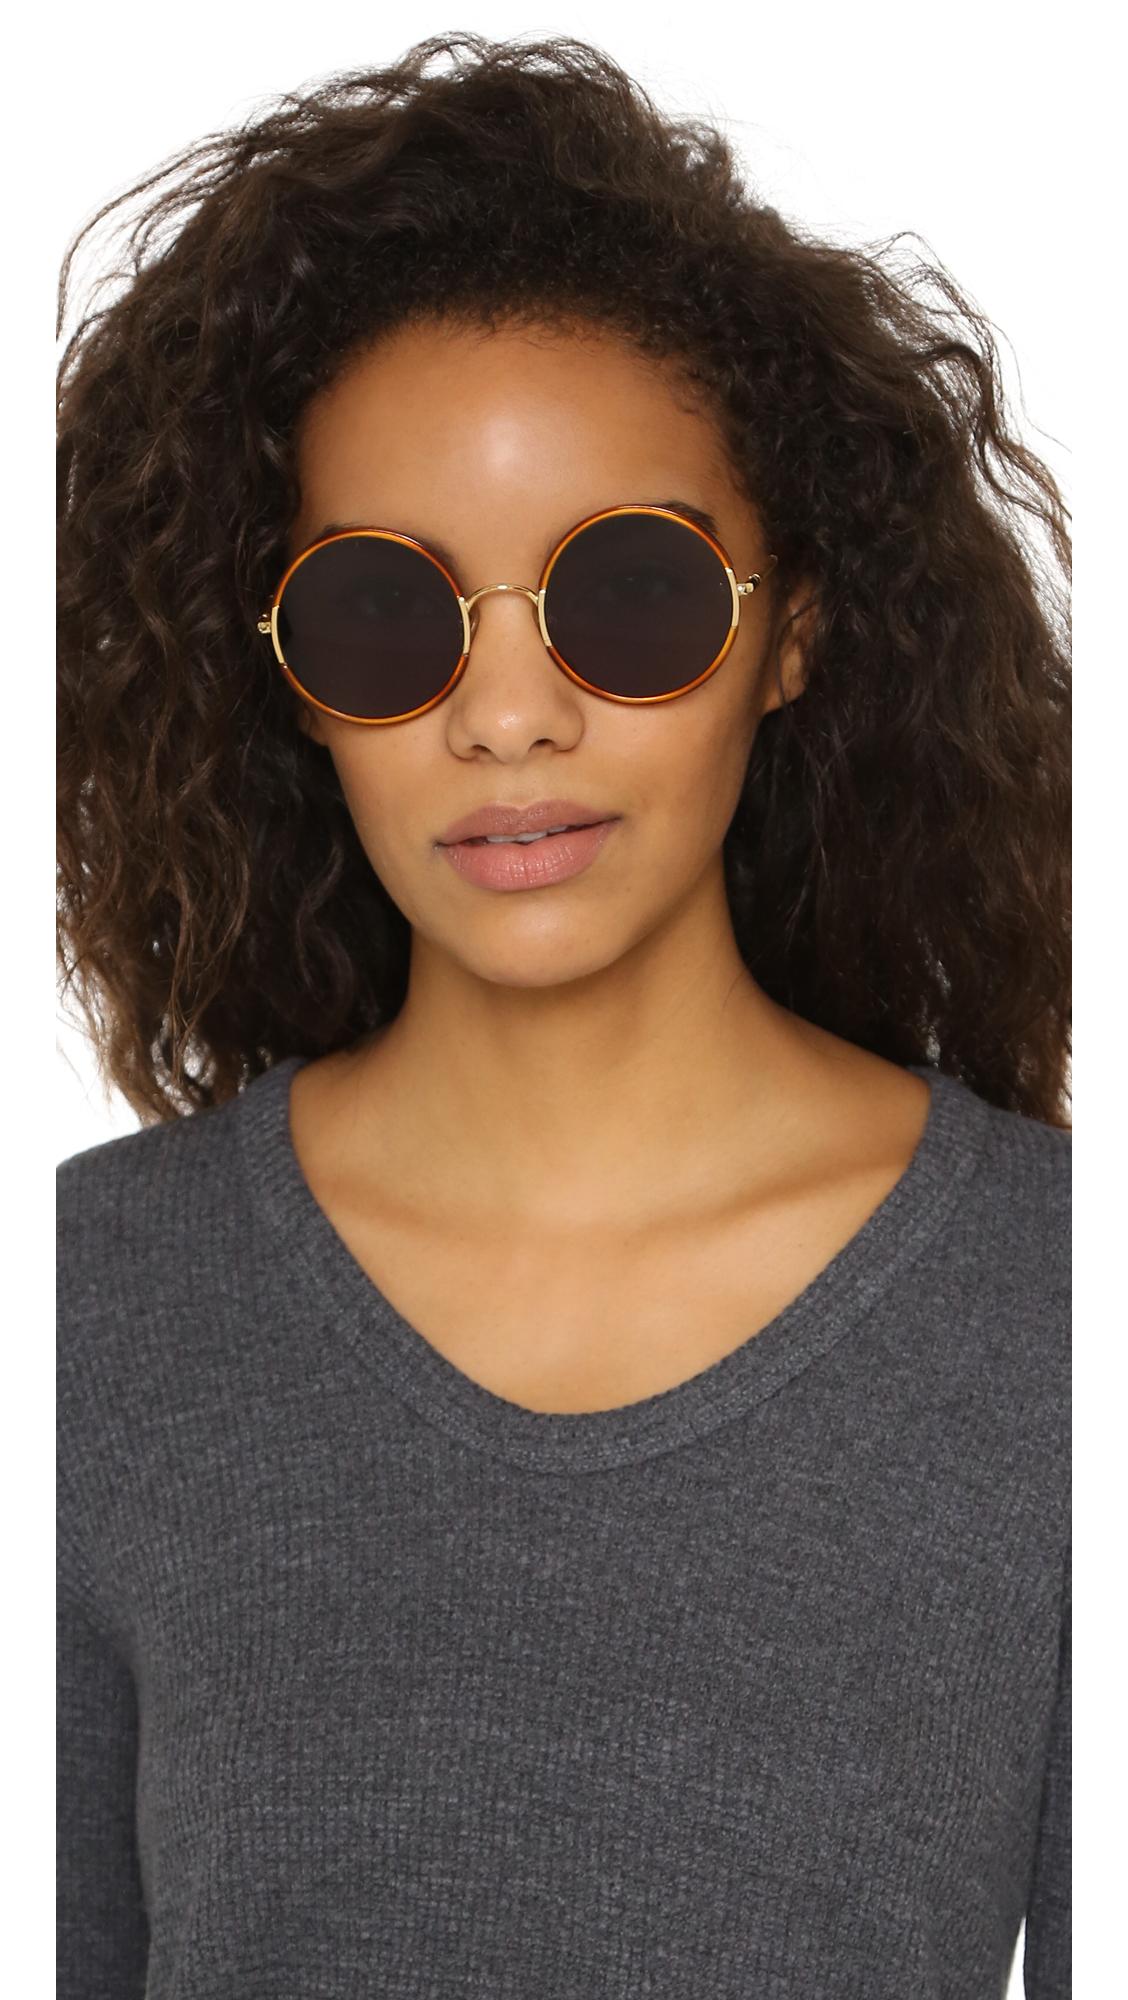 round yetti sunglasses - Brown Sunday Somewhere A2gfUqY